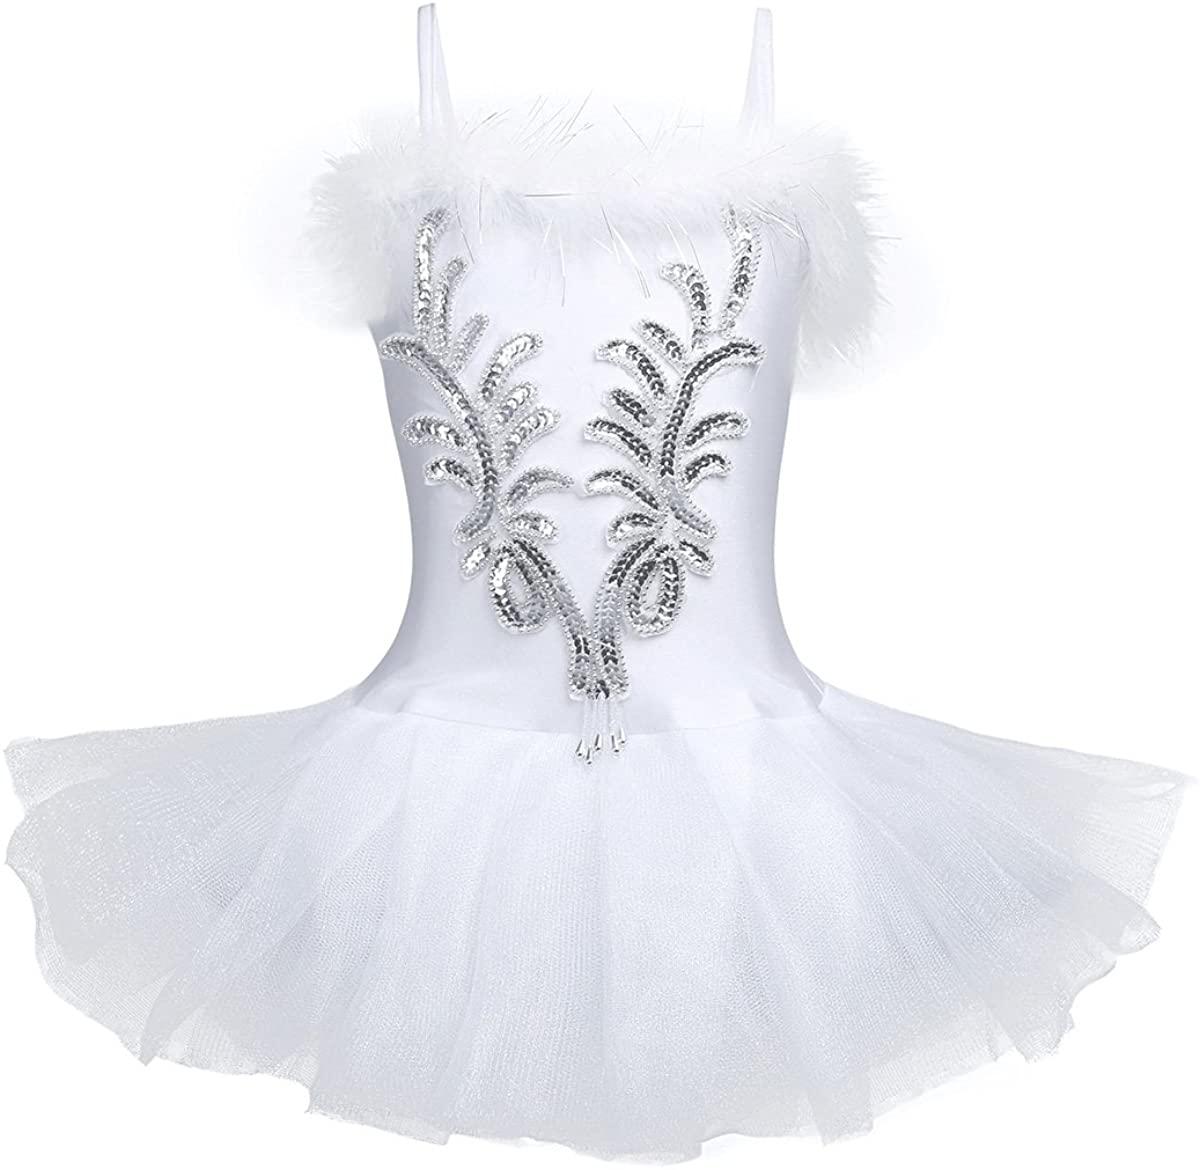 iEFiEL Girls Sequins Beads Ballet Leotard Tutu Dress Swan Dance Costume with Gloves Hair Clip